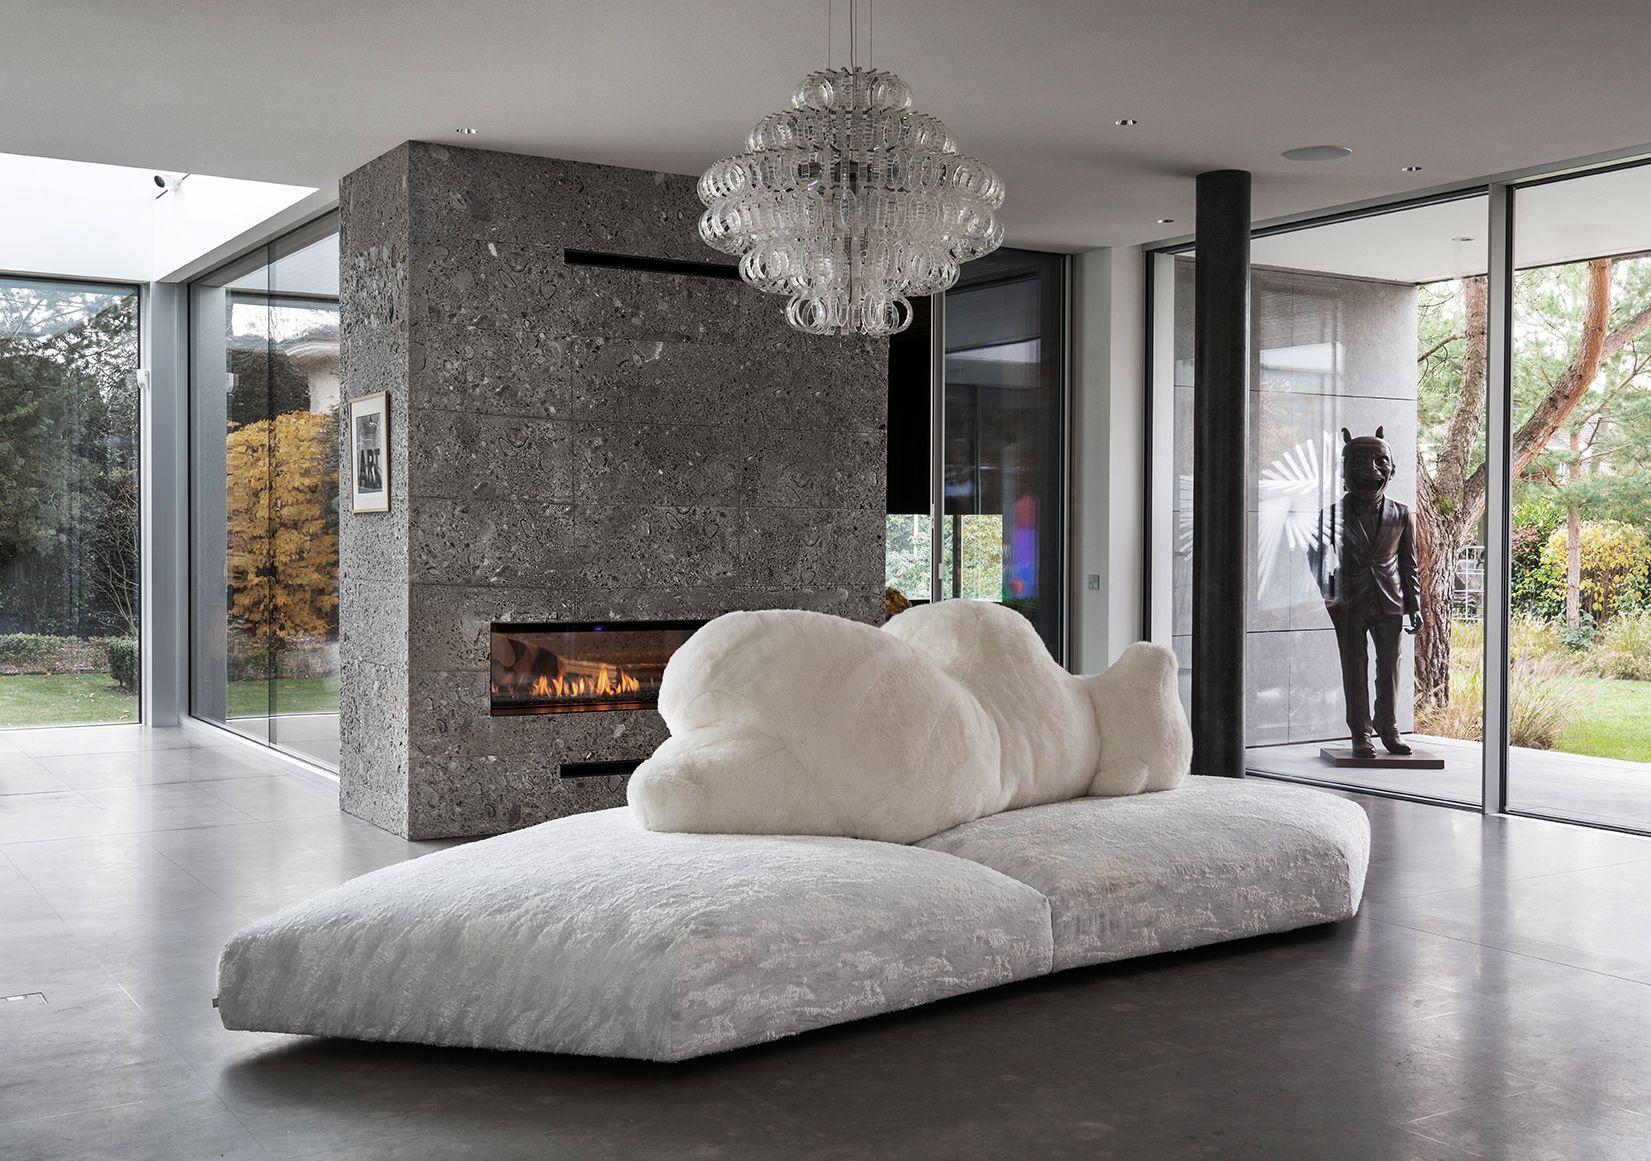 Villa in Svizzera - image 1